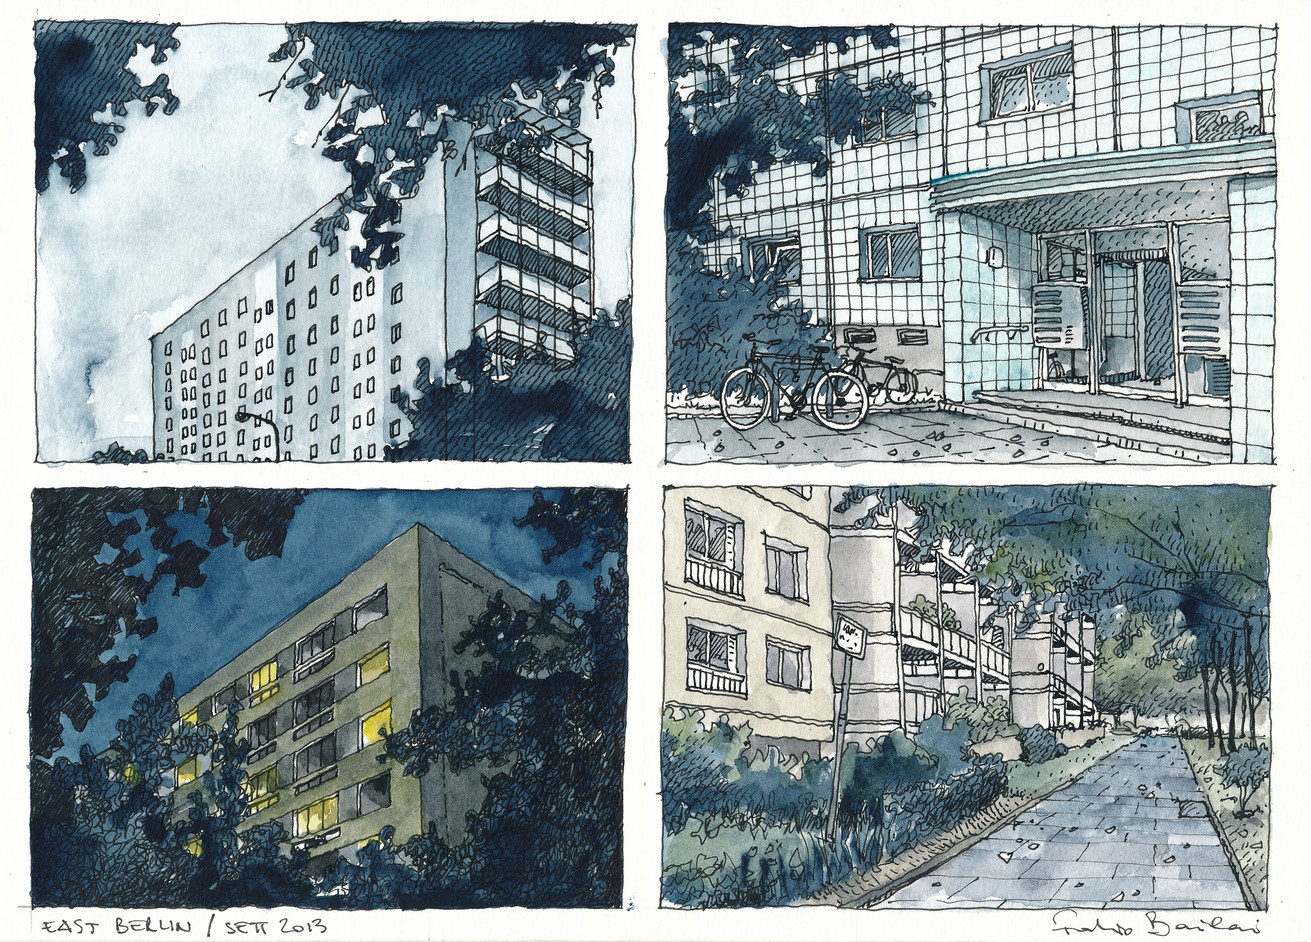 East Berlin - Sketches